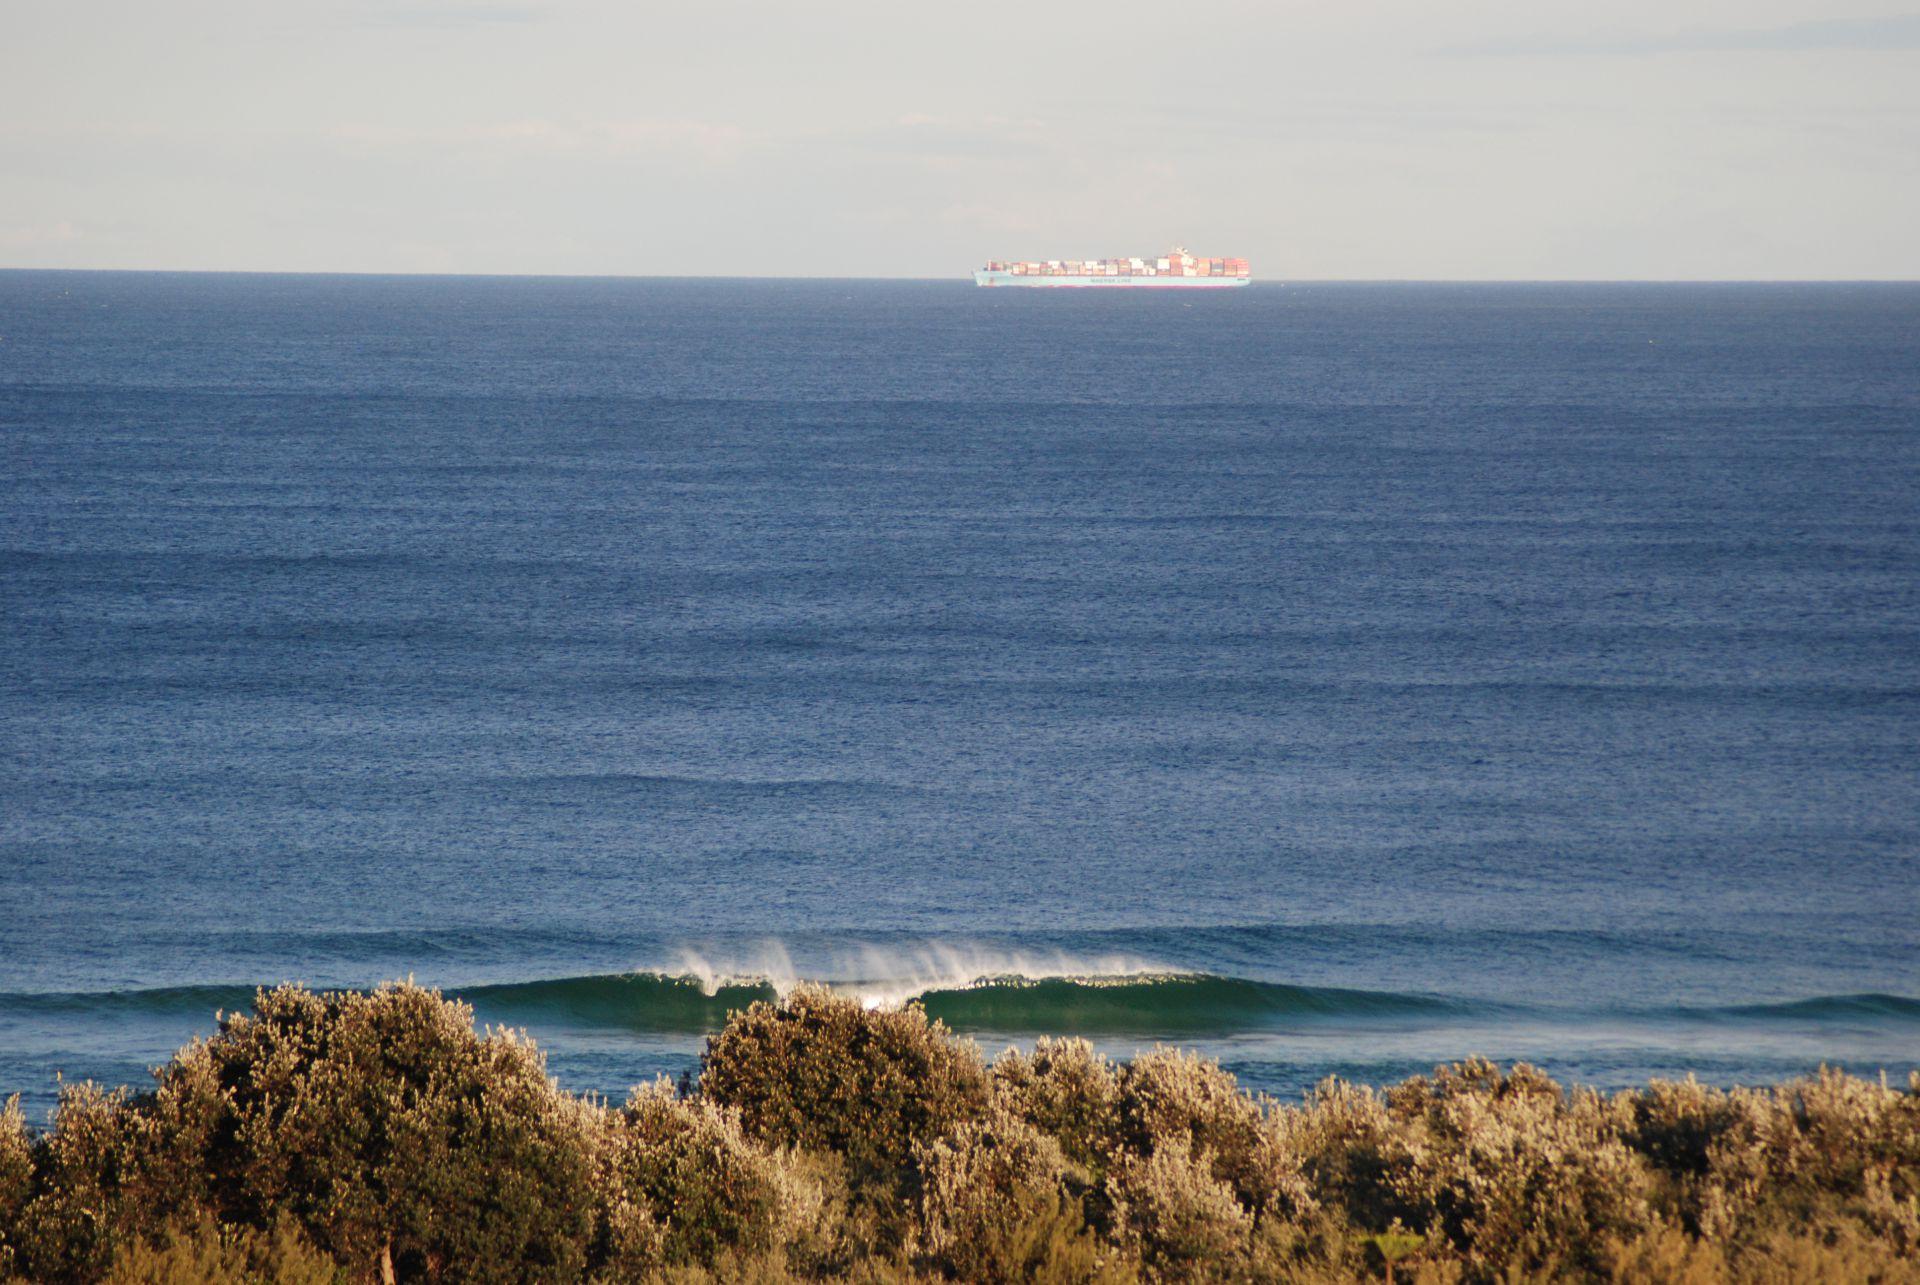 Views Of The Ocean sea dreamin' at byron surf, beach, ocean views over arakwal nat